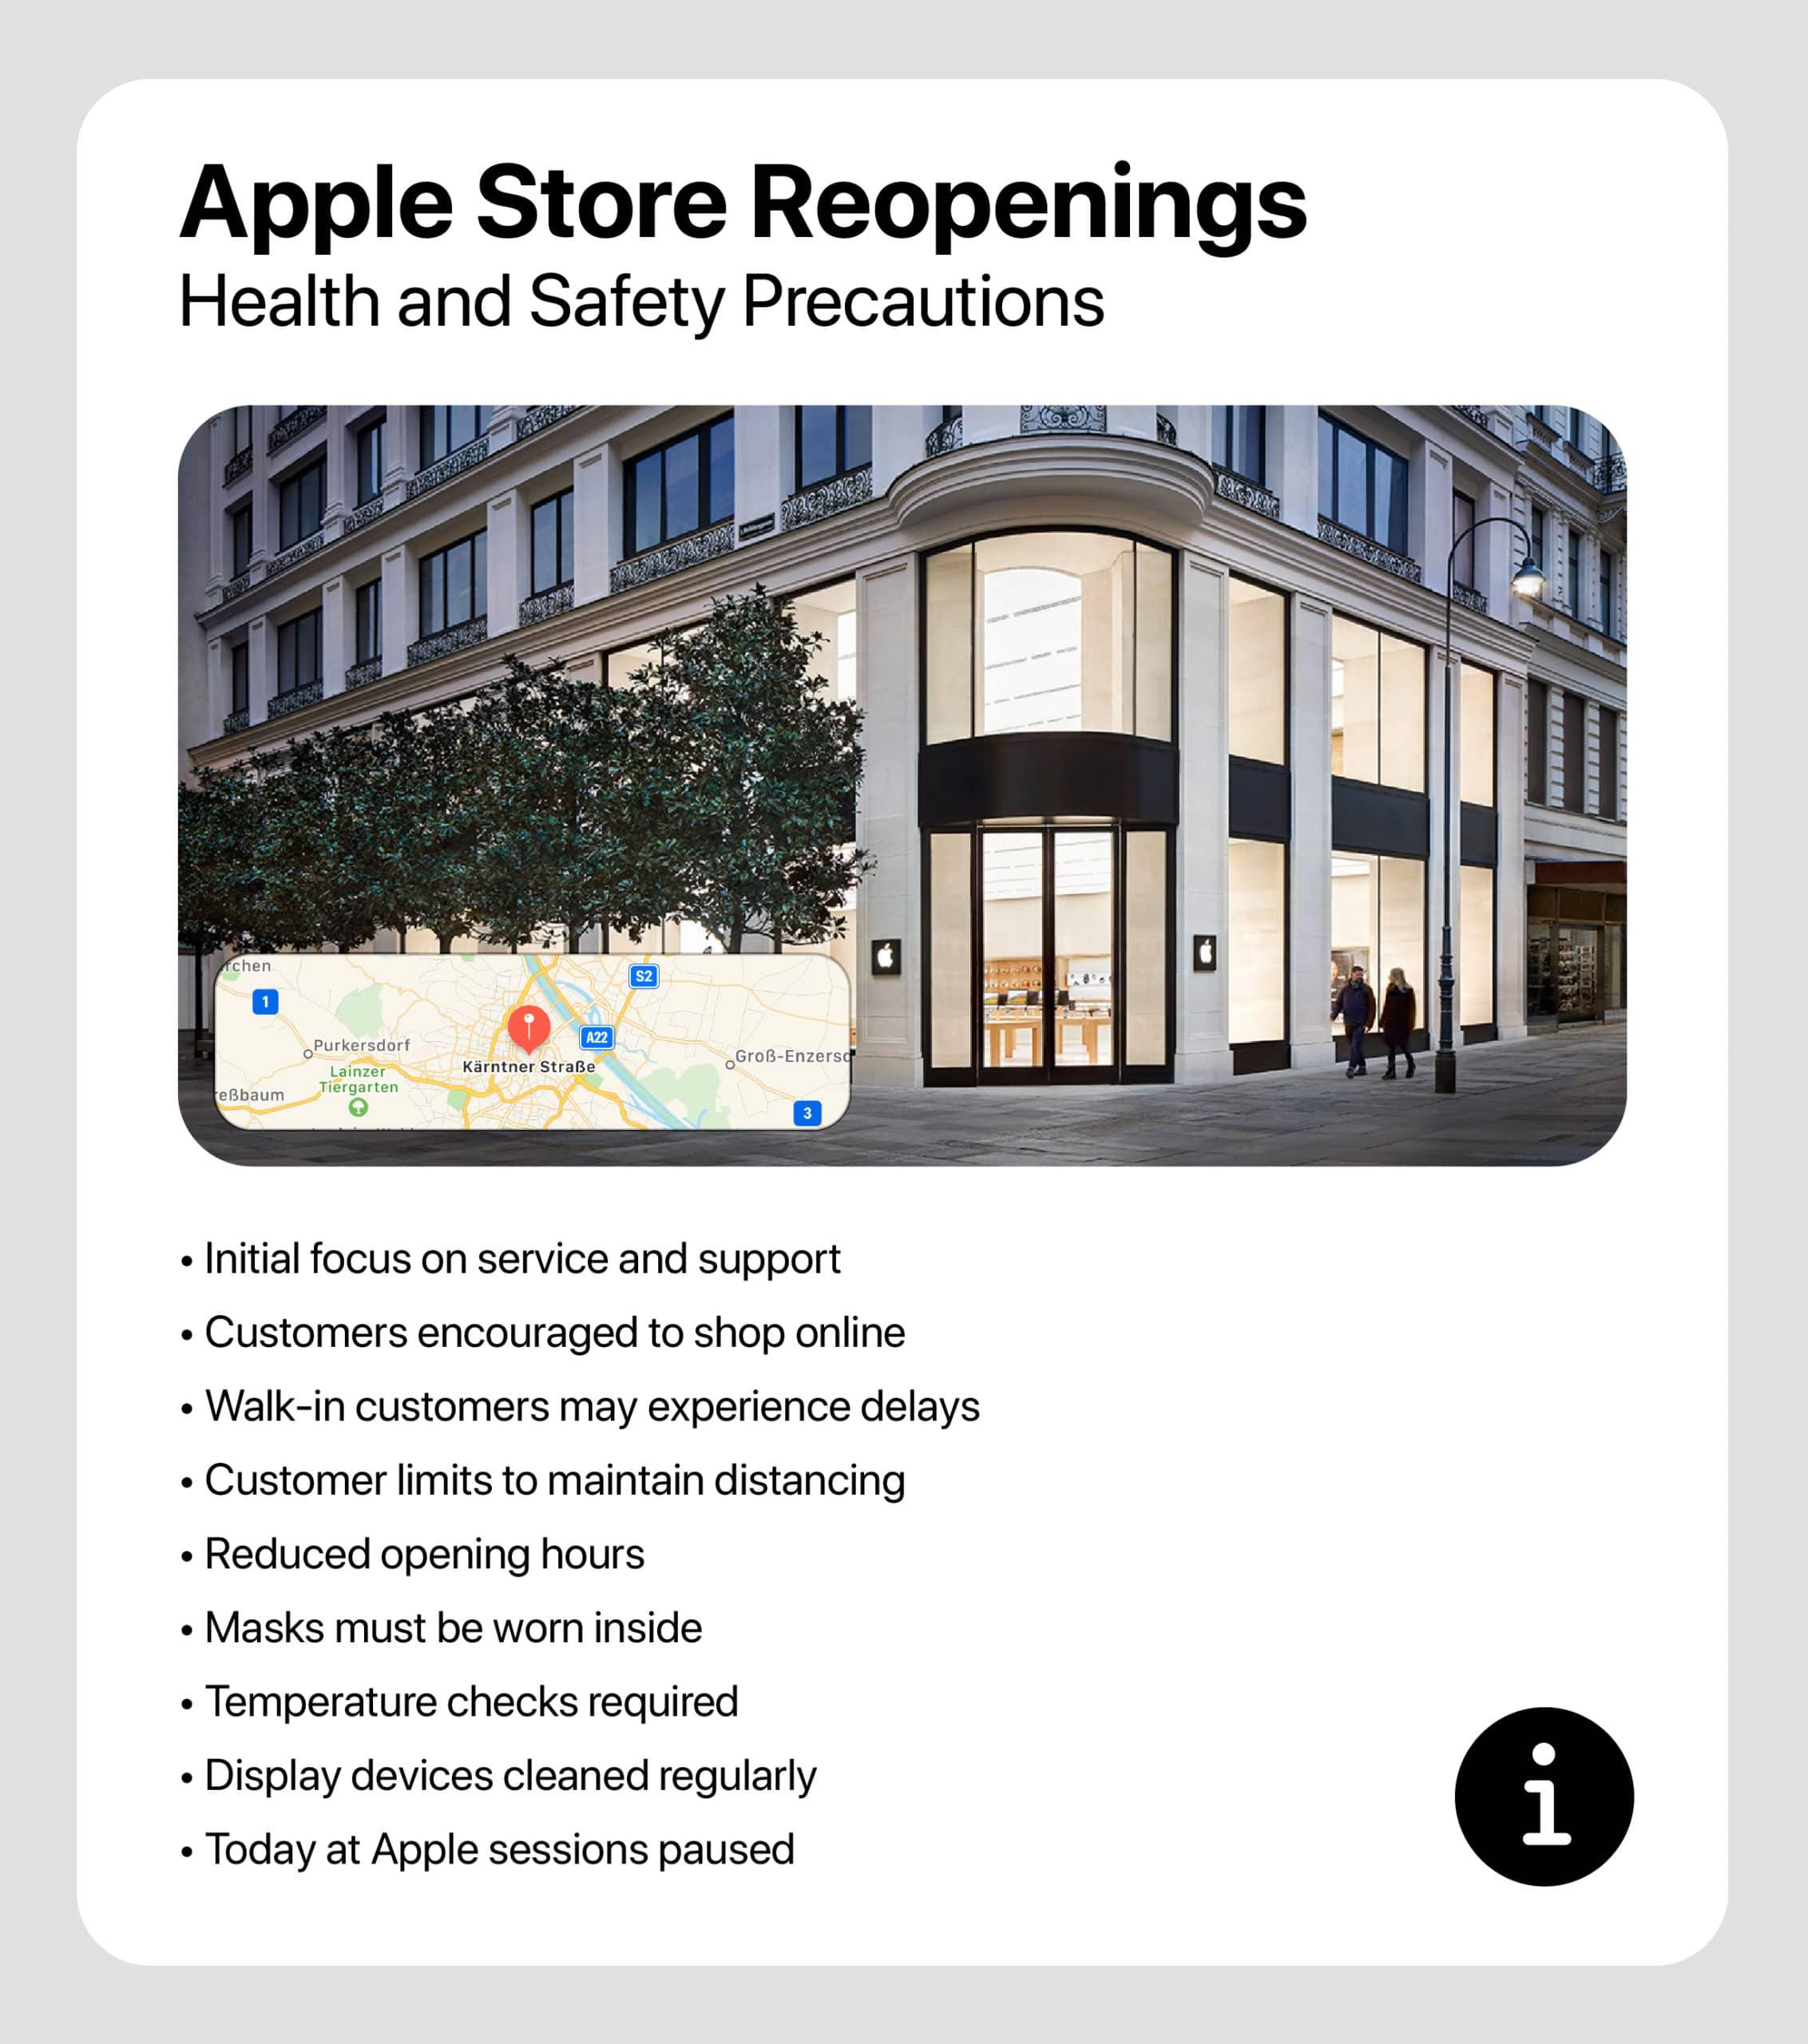 Reabertura da loja da Apple na Áustria